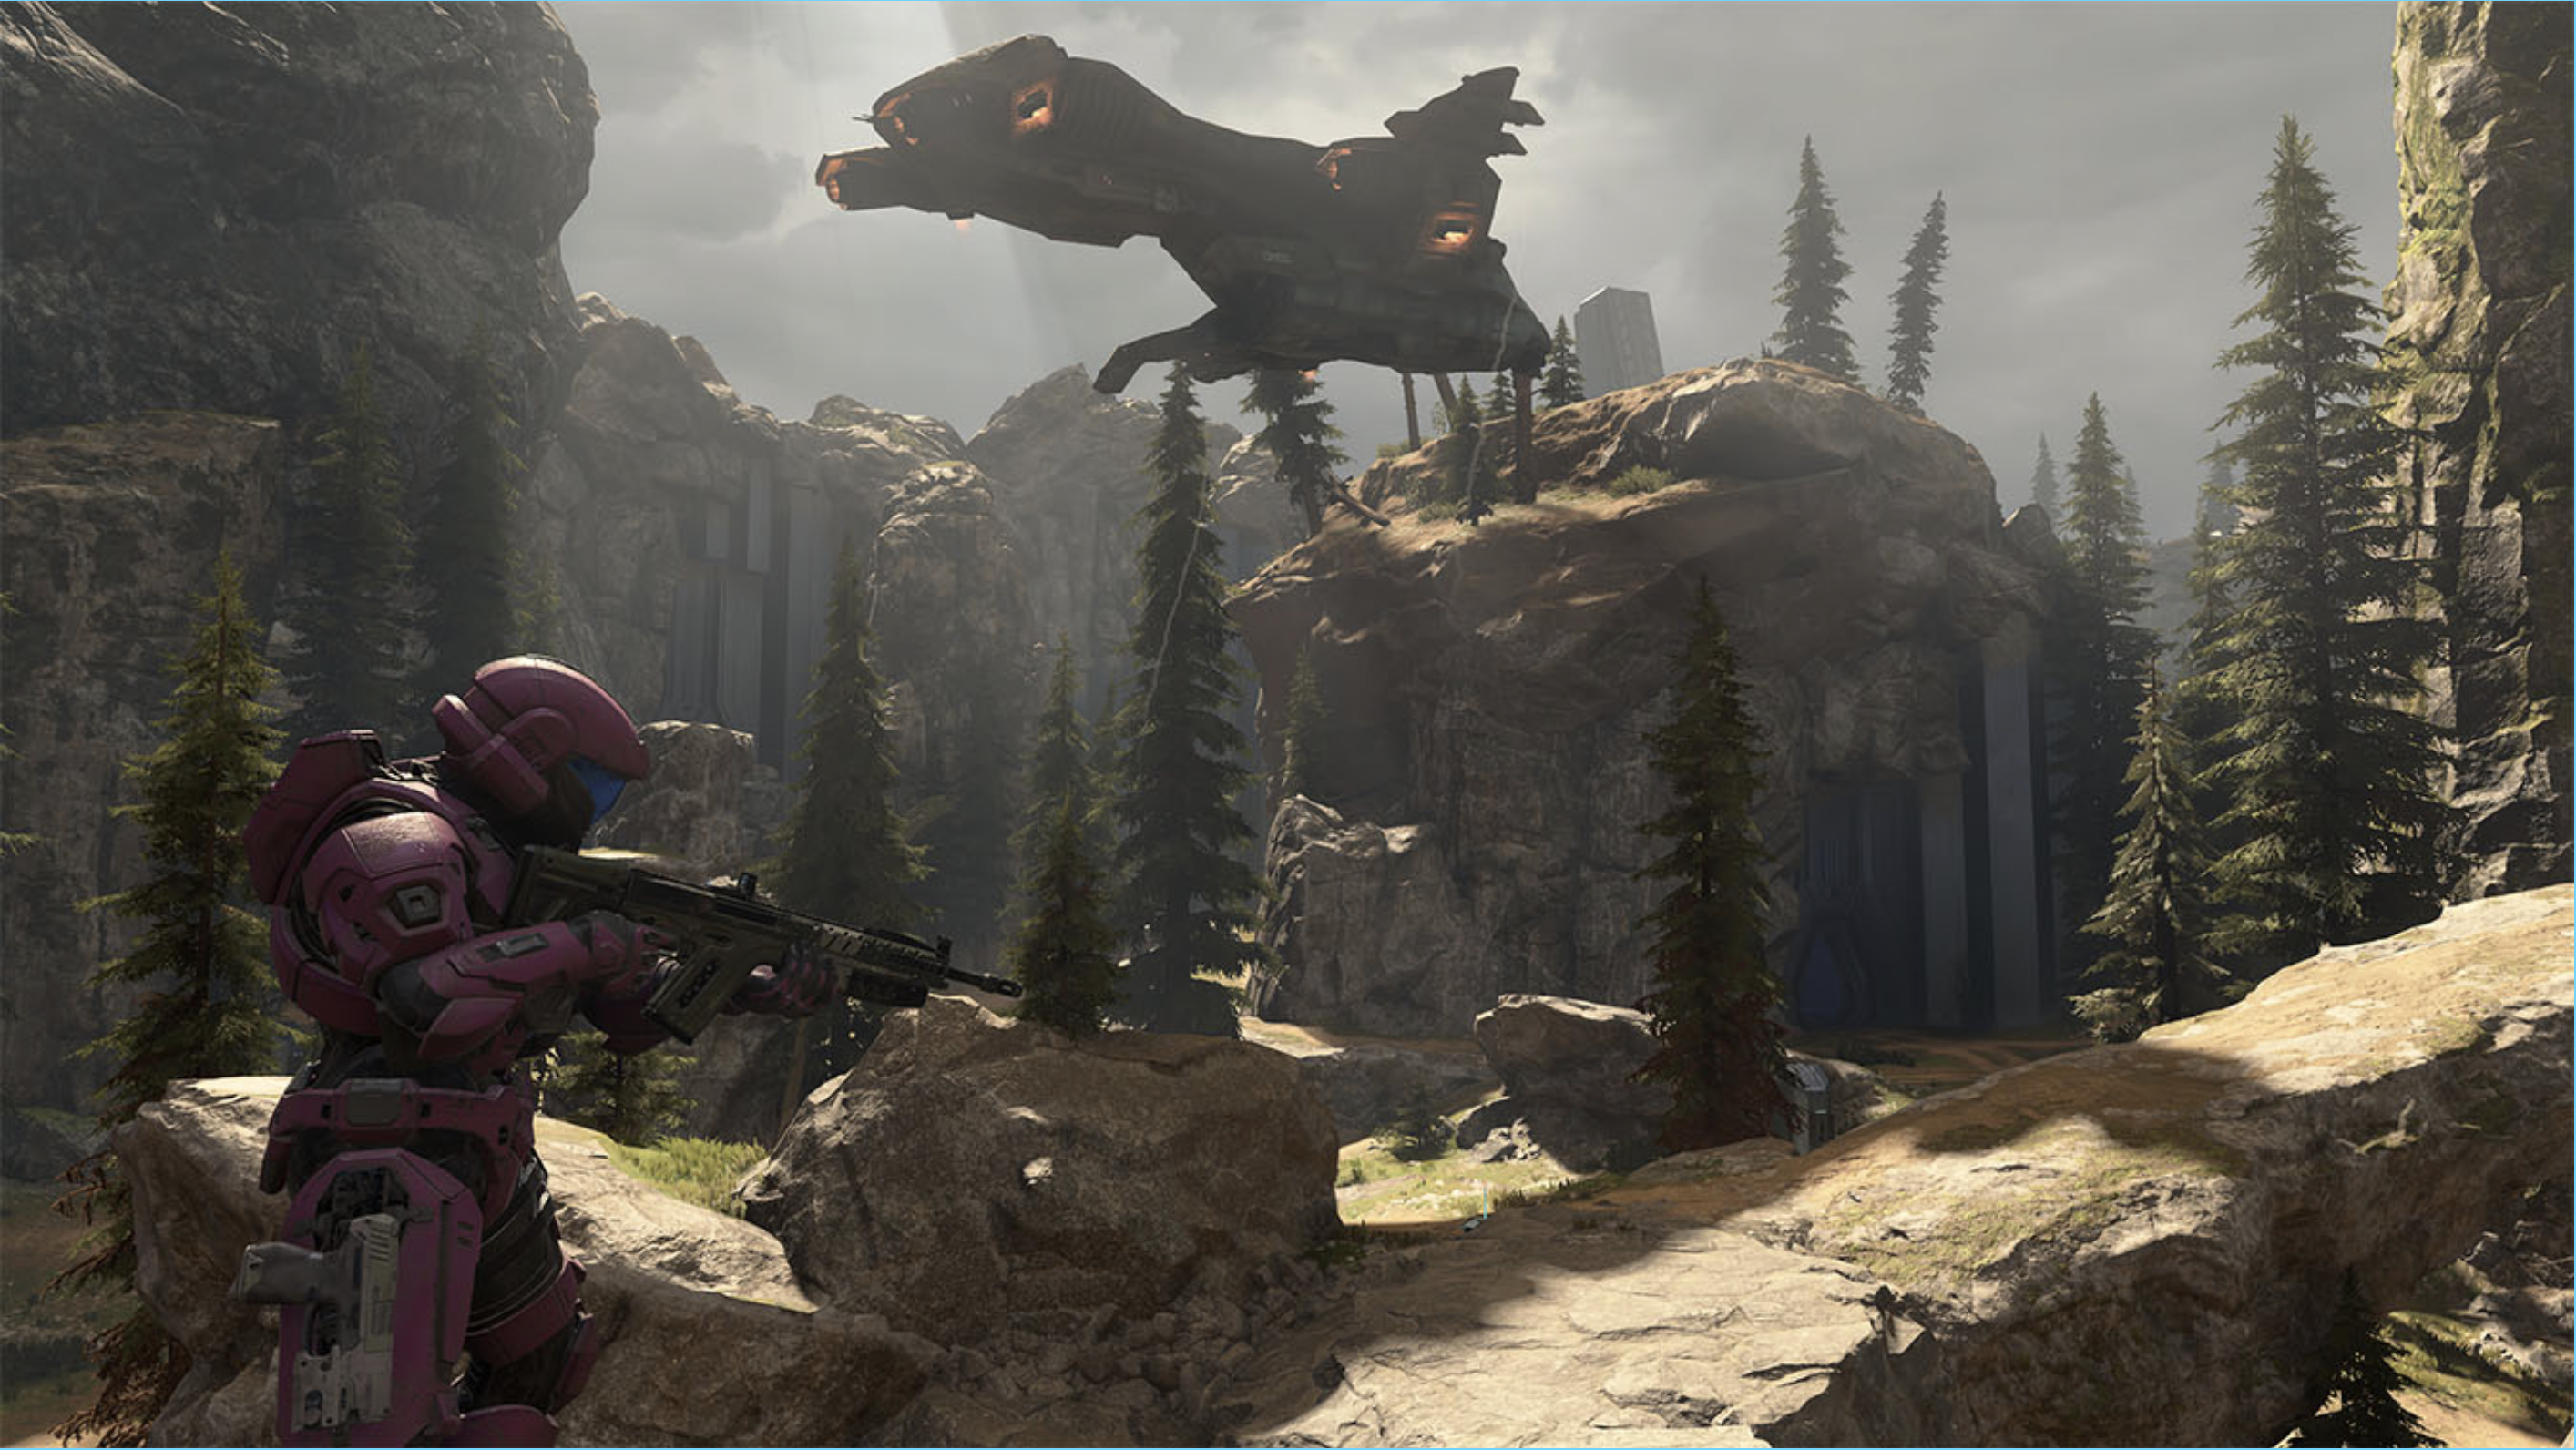 X35 Earthwalker Halo Infinite multiplayer